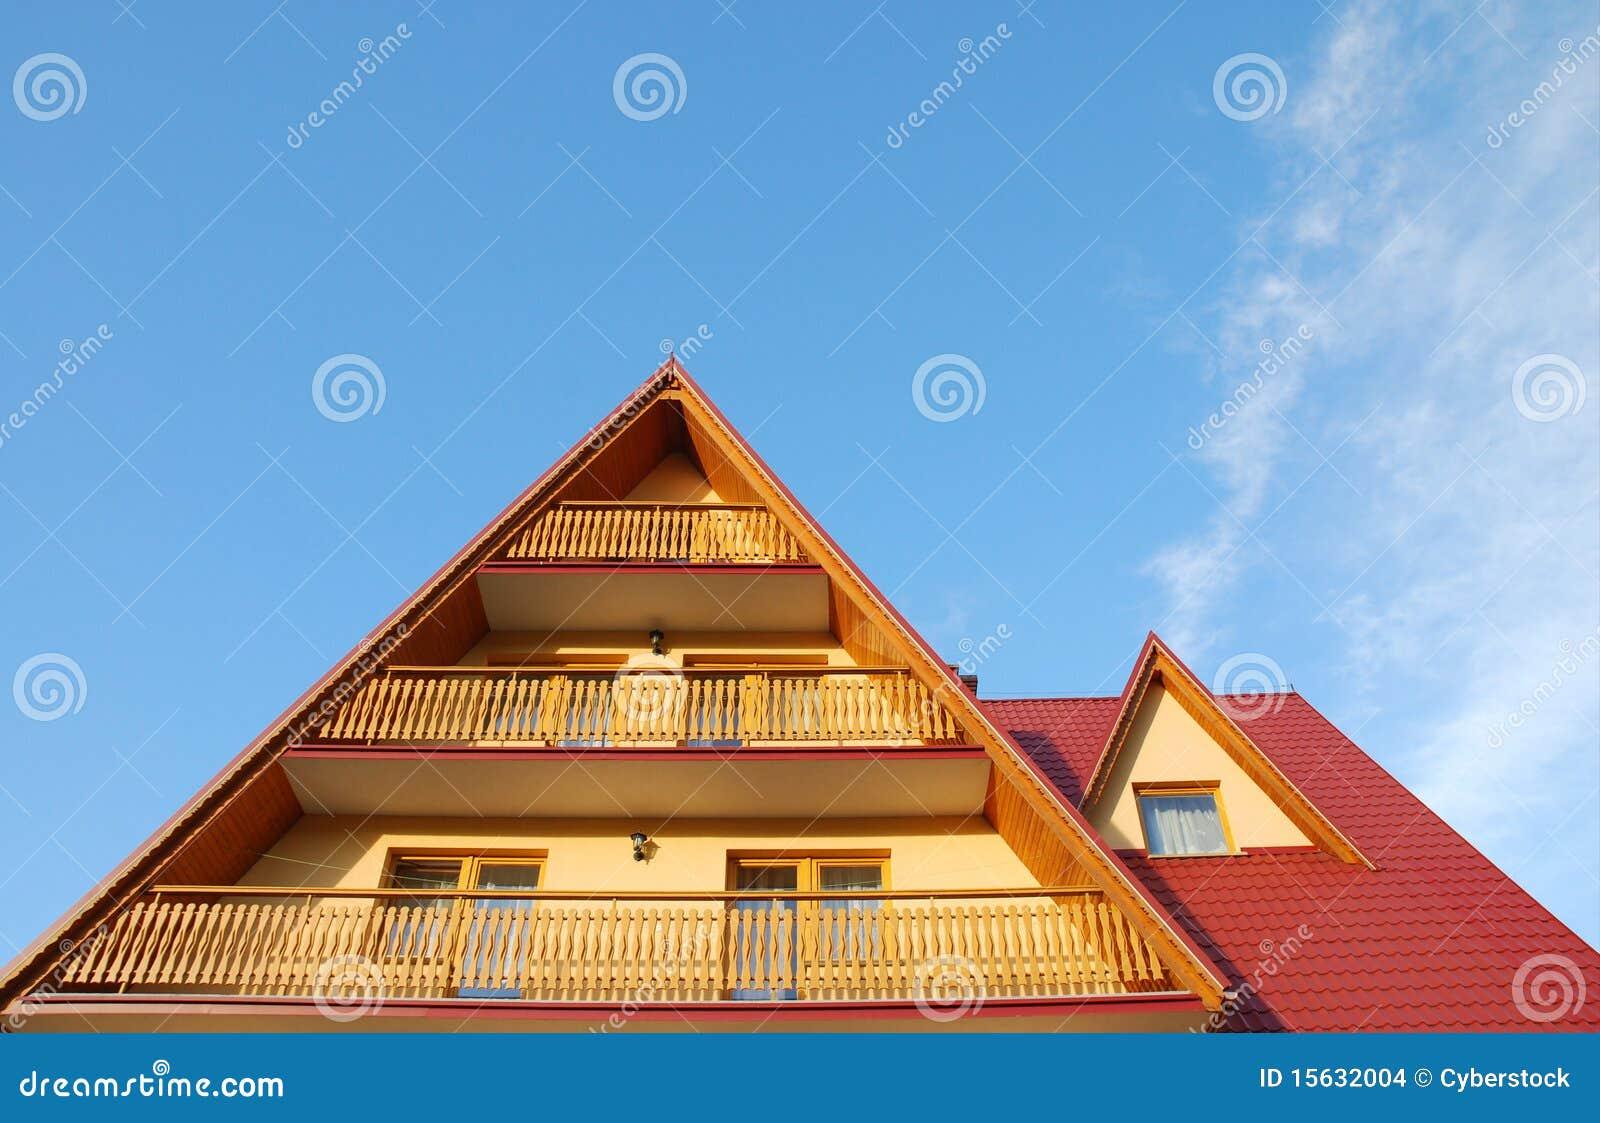 toit et balcon images stock image 15632004. Black Bedroom Furniture Sets. Home Design Ideas